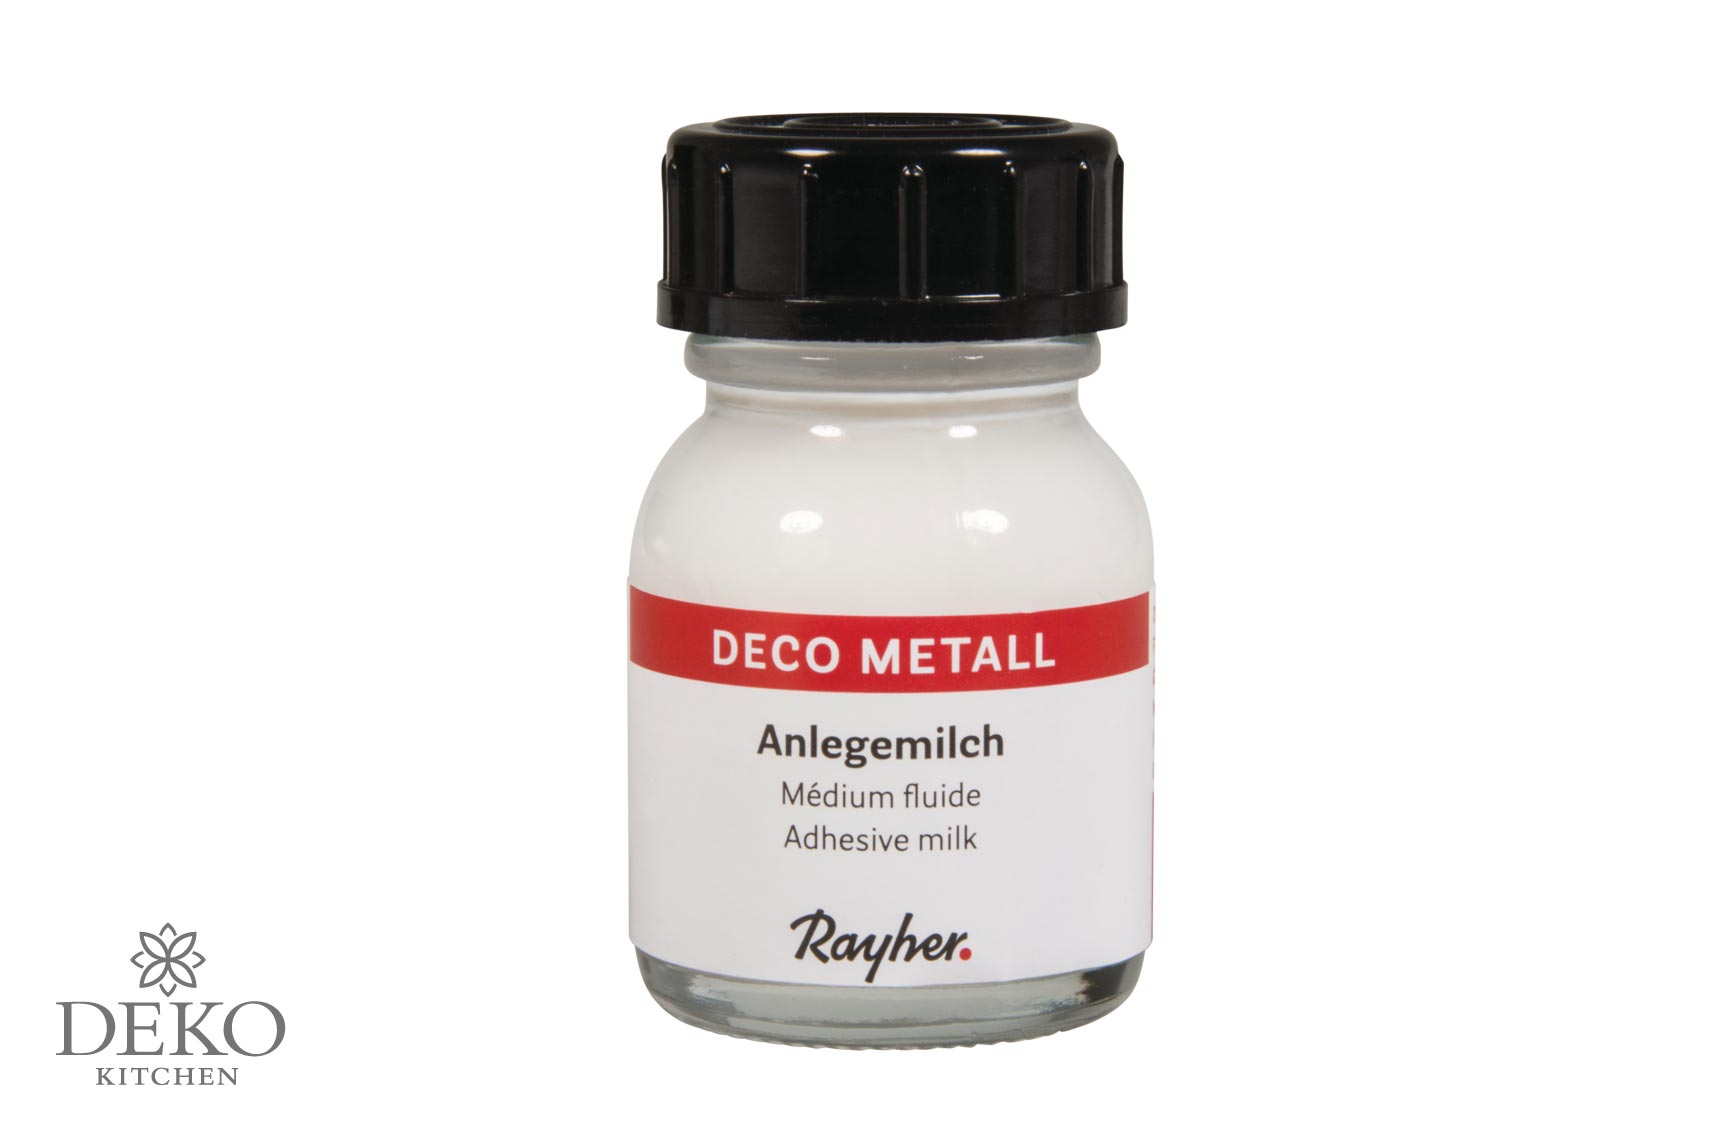 Deco metall anlegemilch 25 ml deko kitchen shop for Metall deko shop